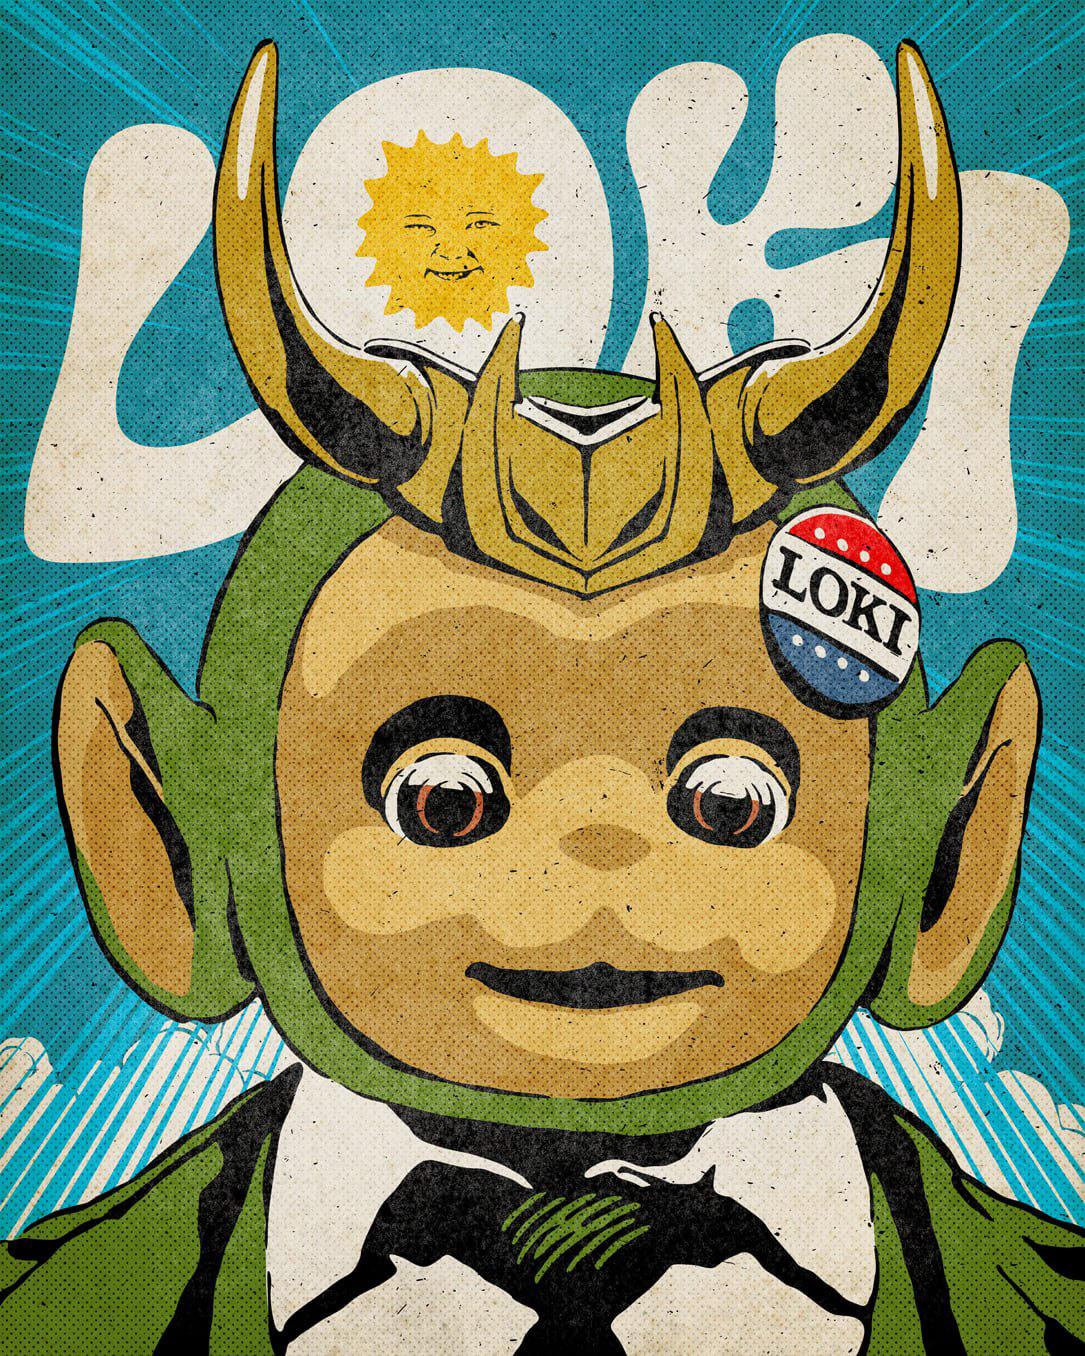 comics kate herron Loki marvel Owen Wilson playstation Ps4 studios Thor tom hiddleston